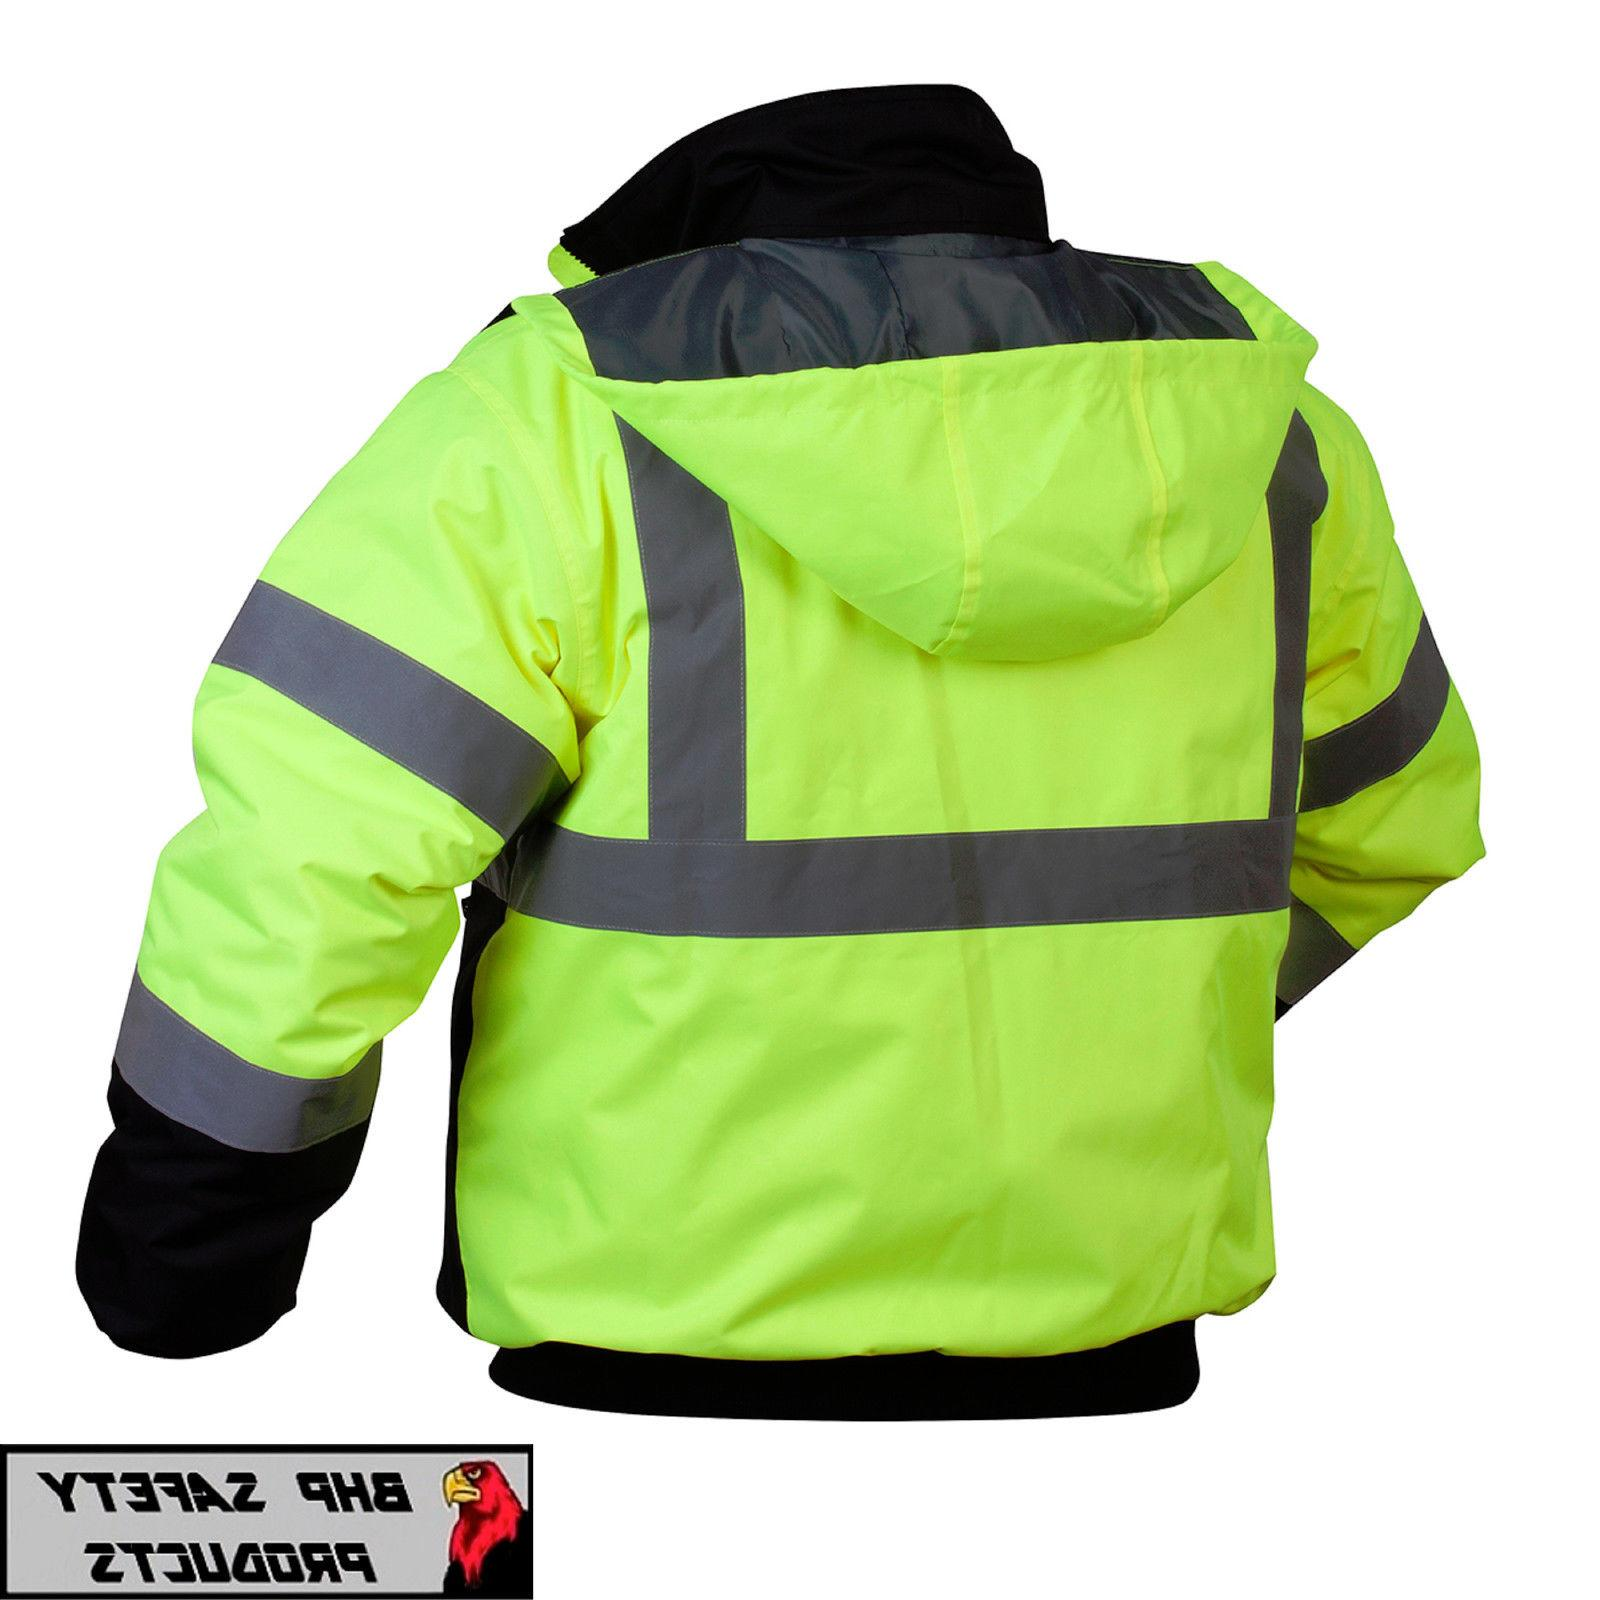 Pyramex Insulated Safety Jacket